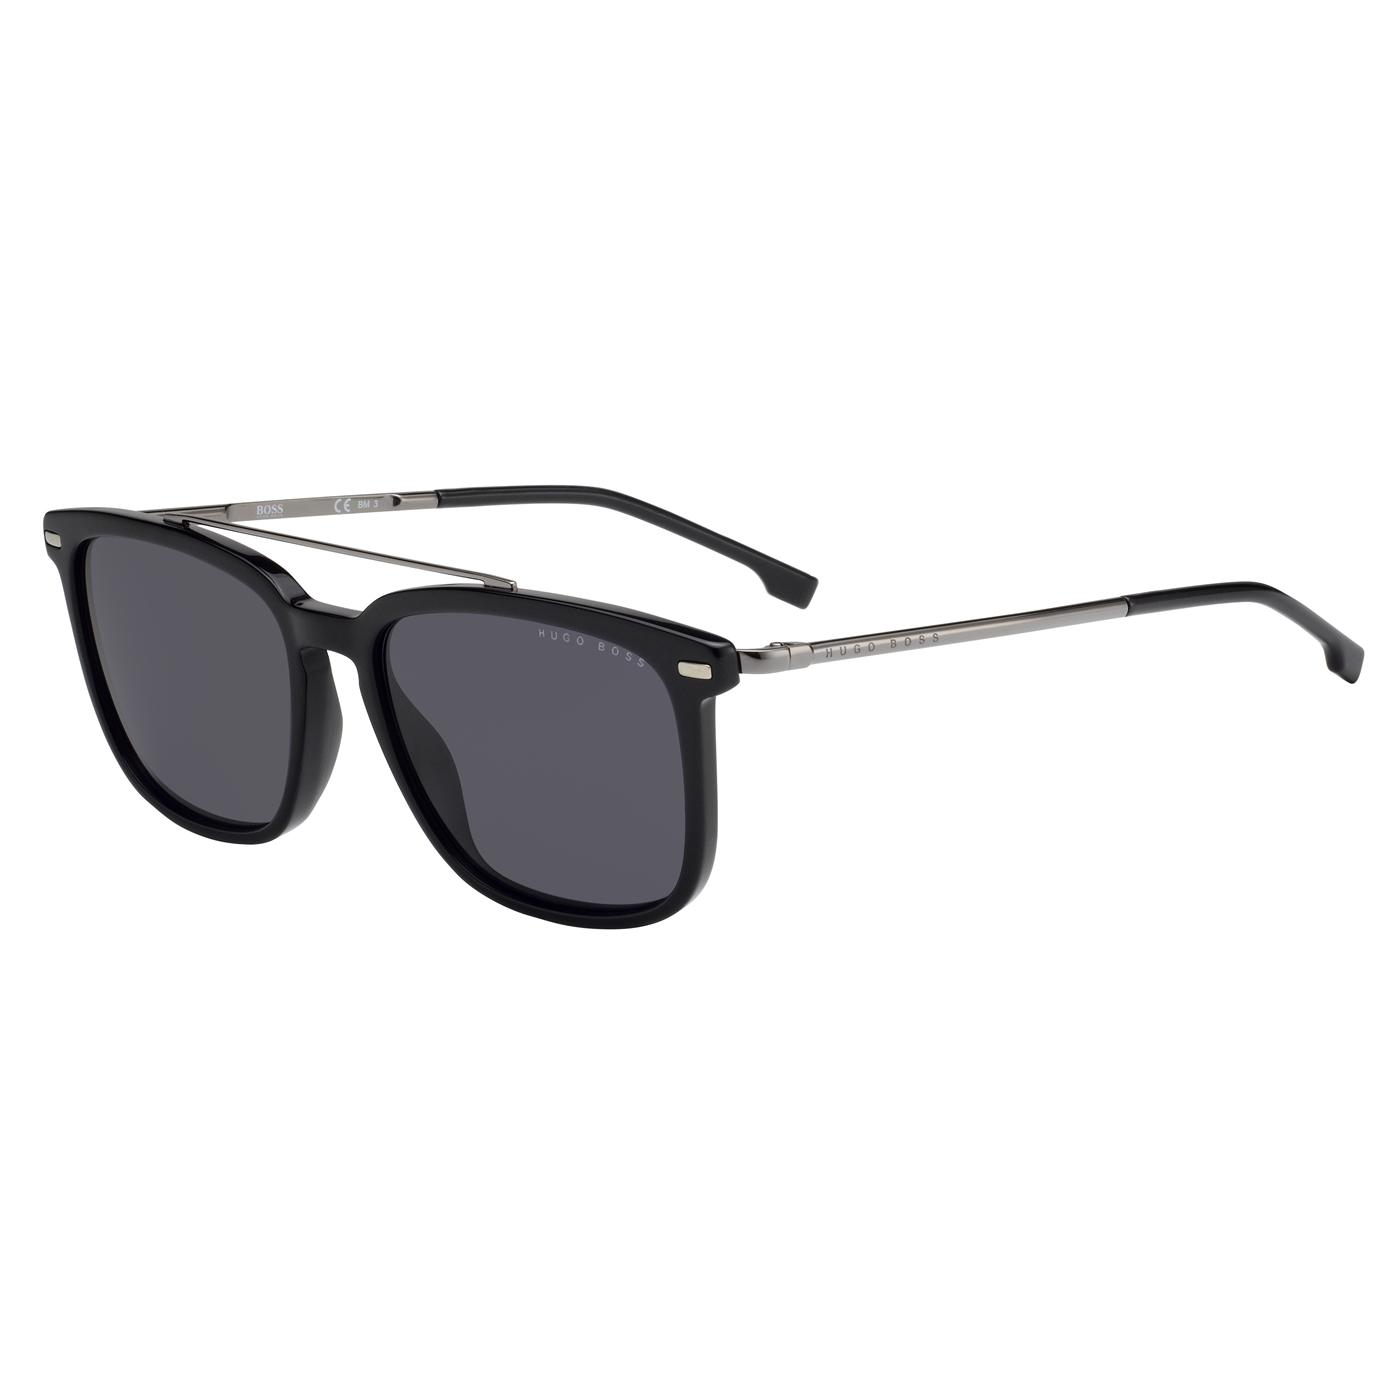 Bilde av Boss Black Sunglasses BOSS 0930S 807 55 IR